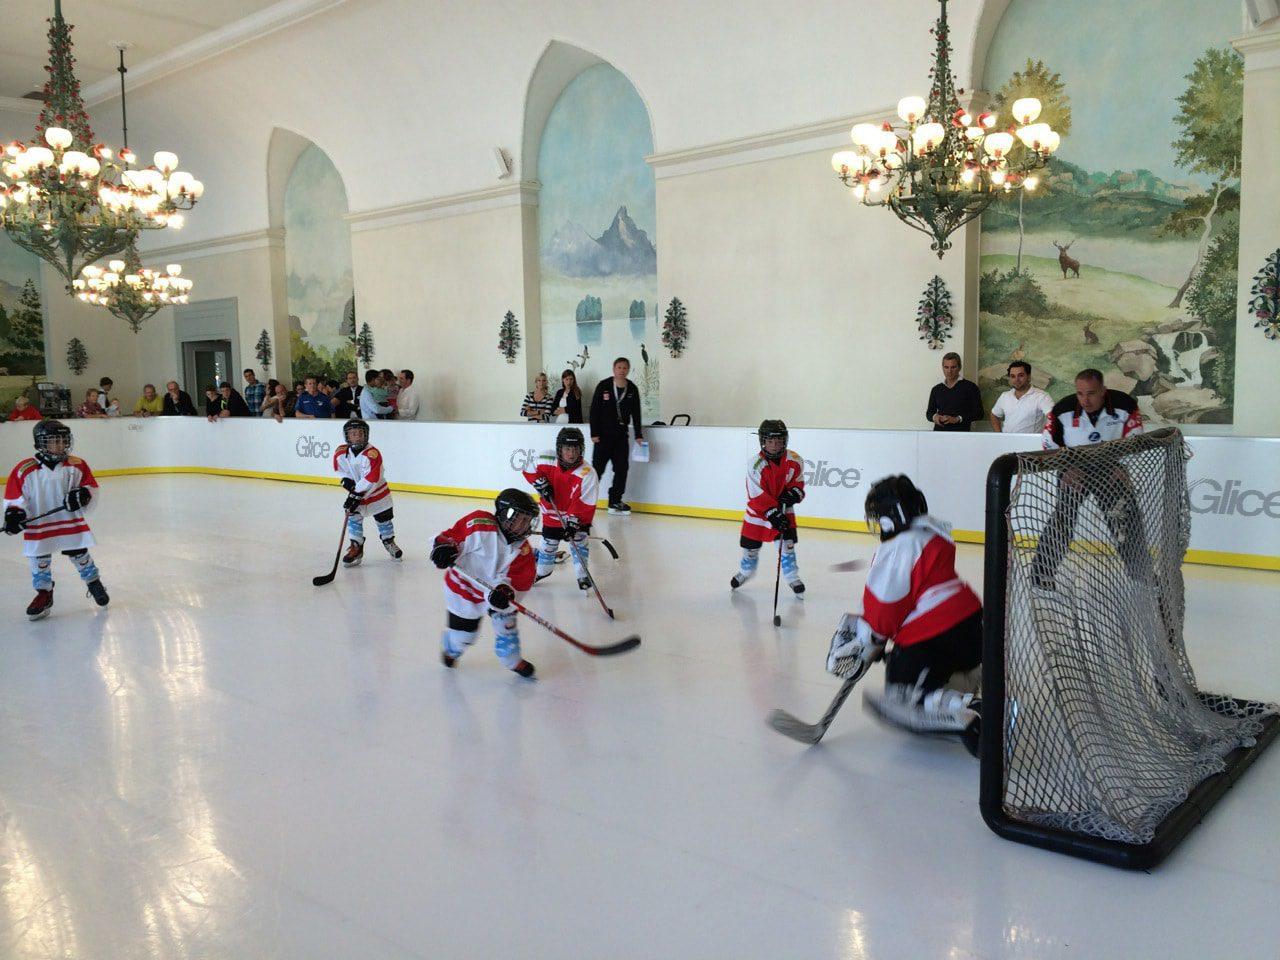 Hockey game Glice fake ice